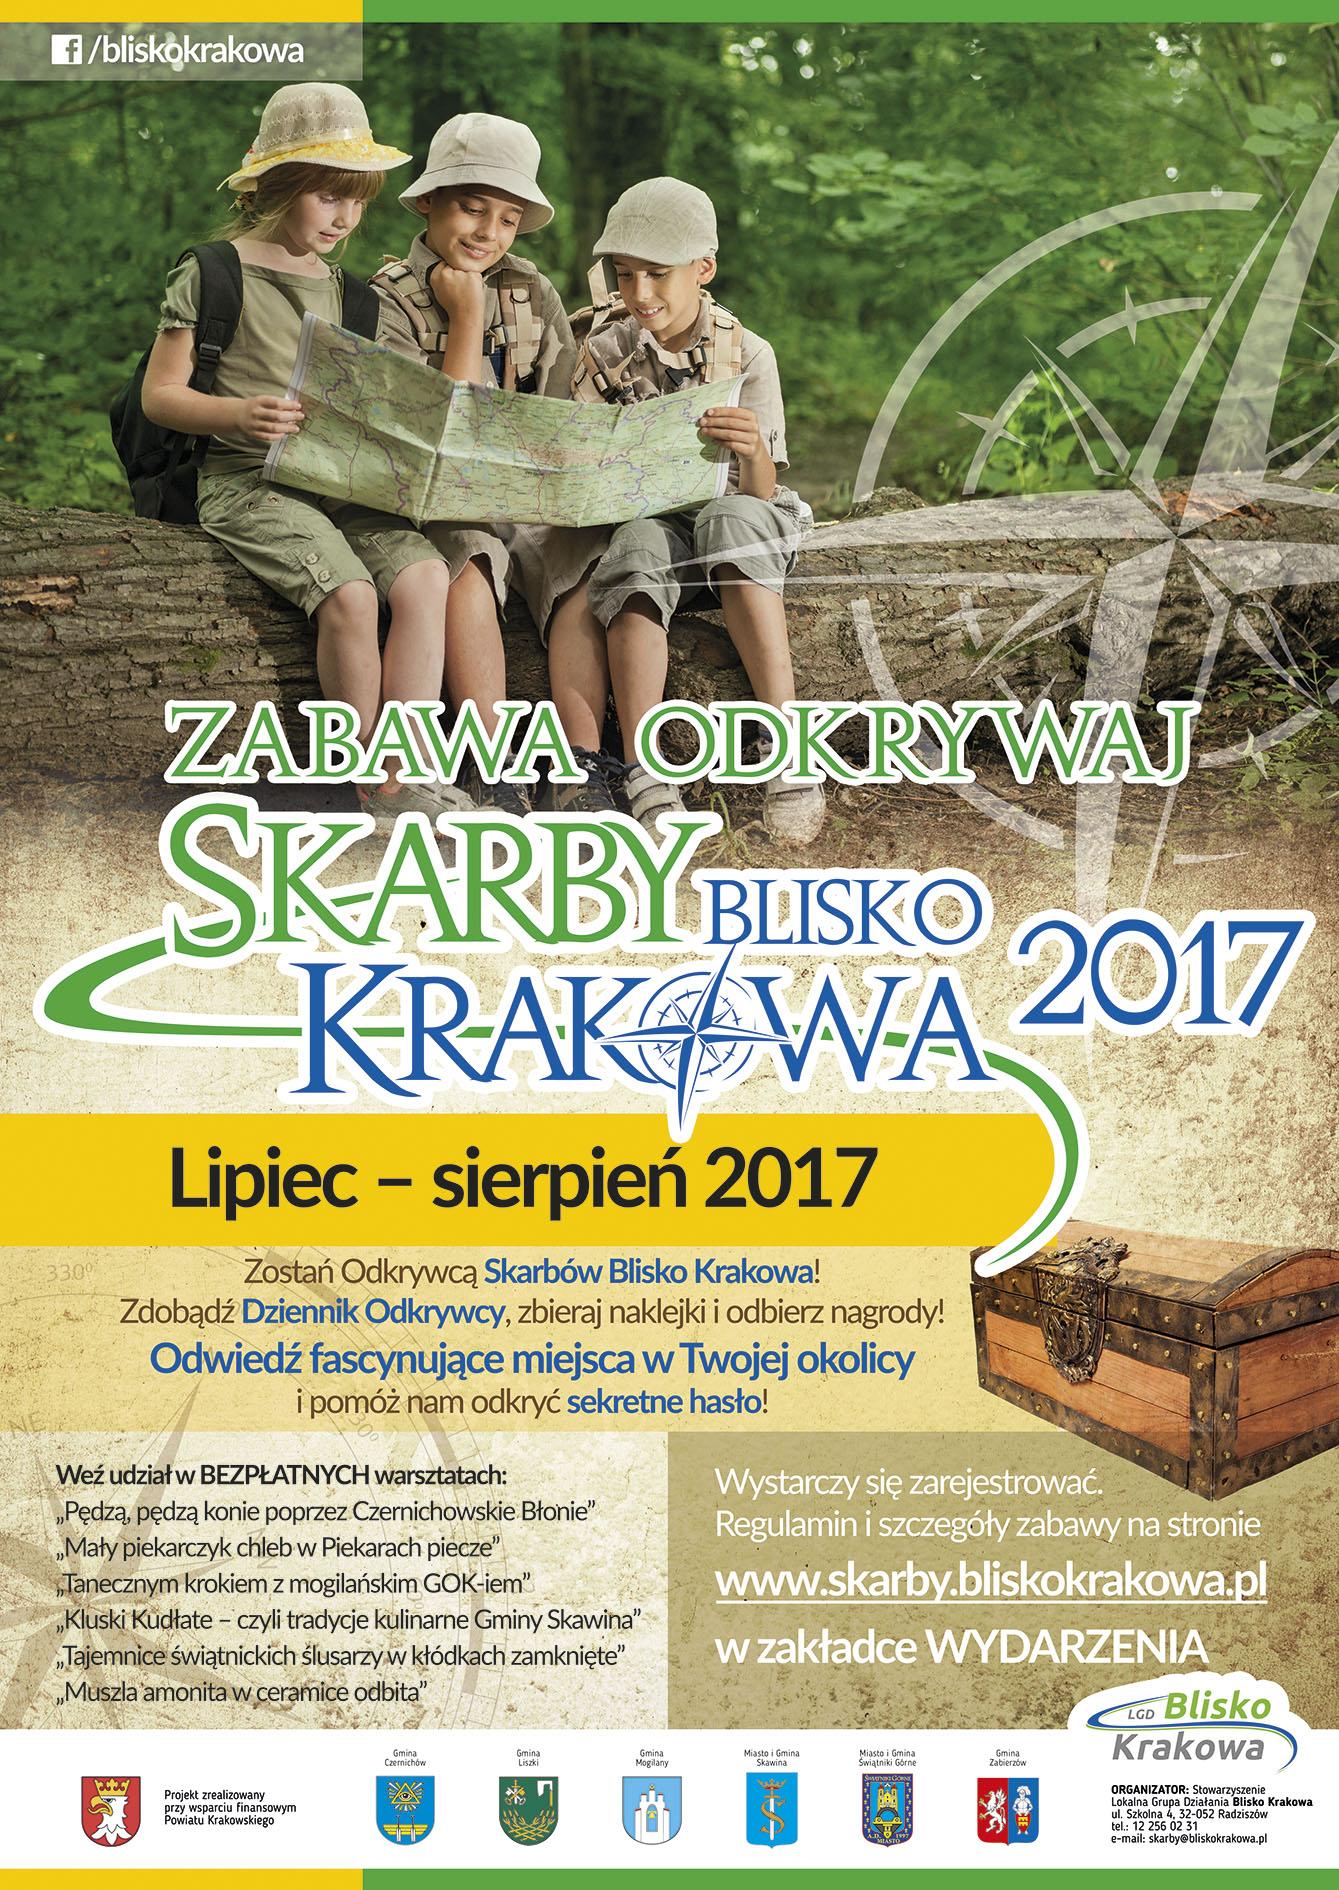 Skarby Blisko Krakowa 2017